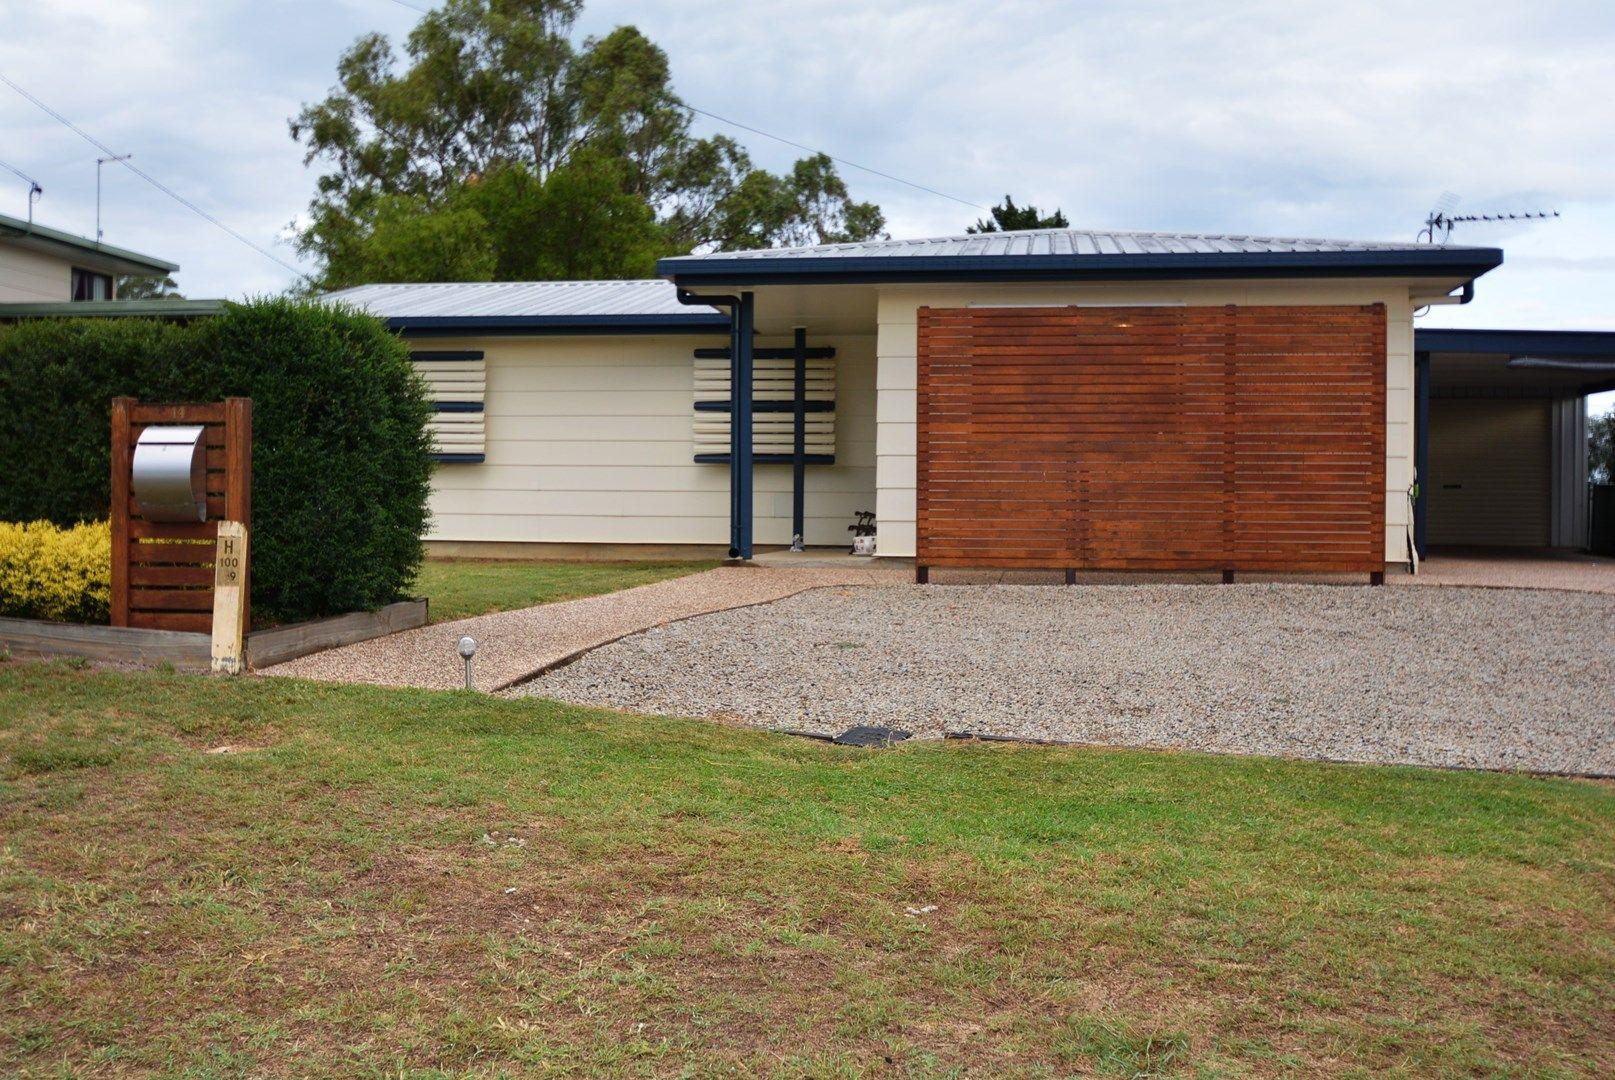 14 Furness Cres, Warwick QLD 4370, Image 0